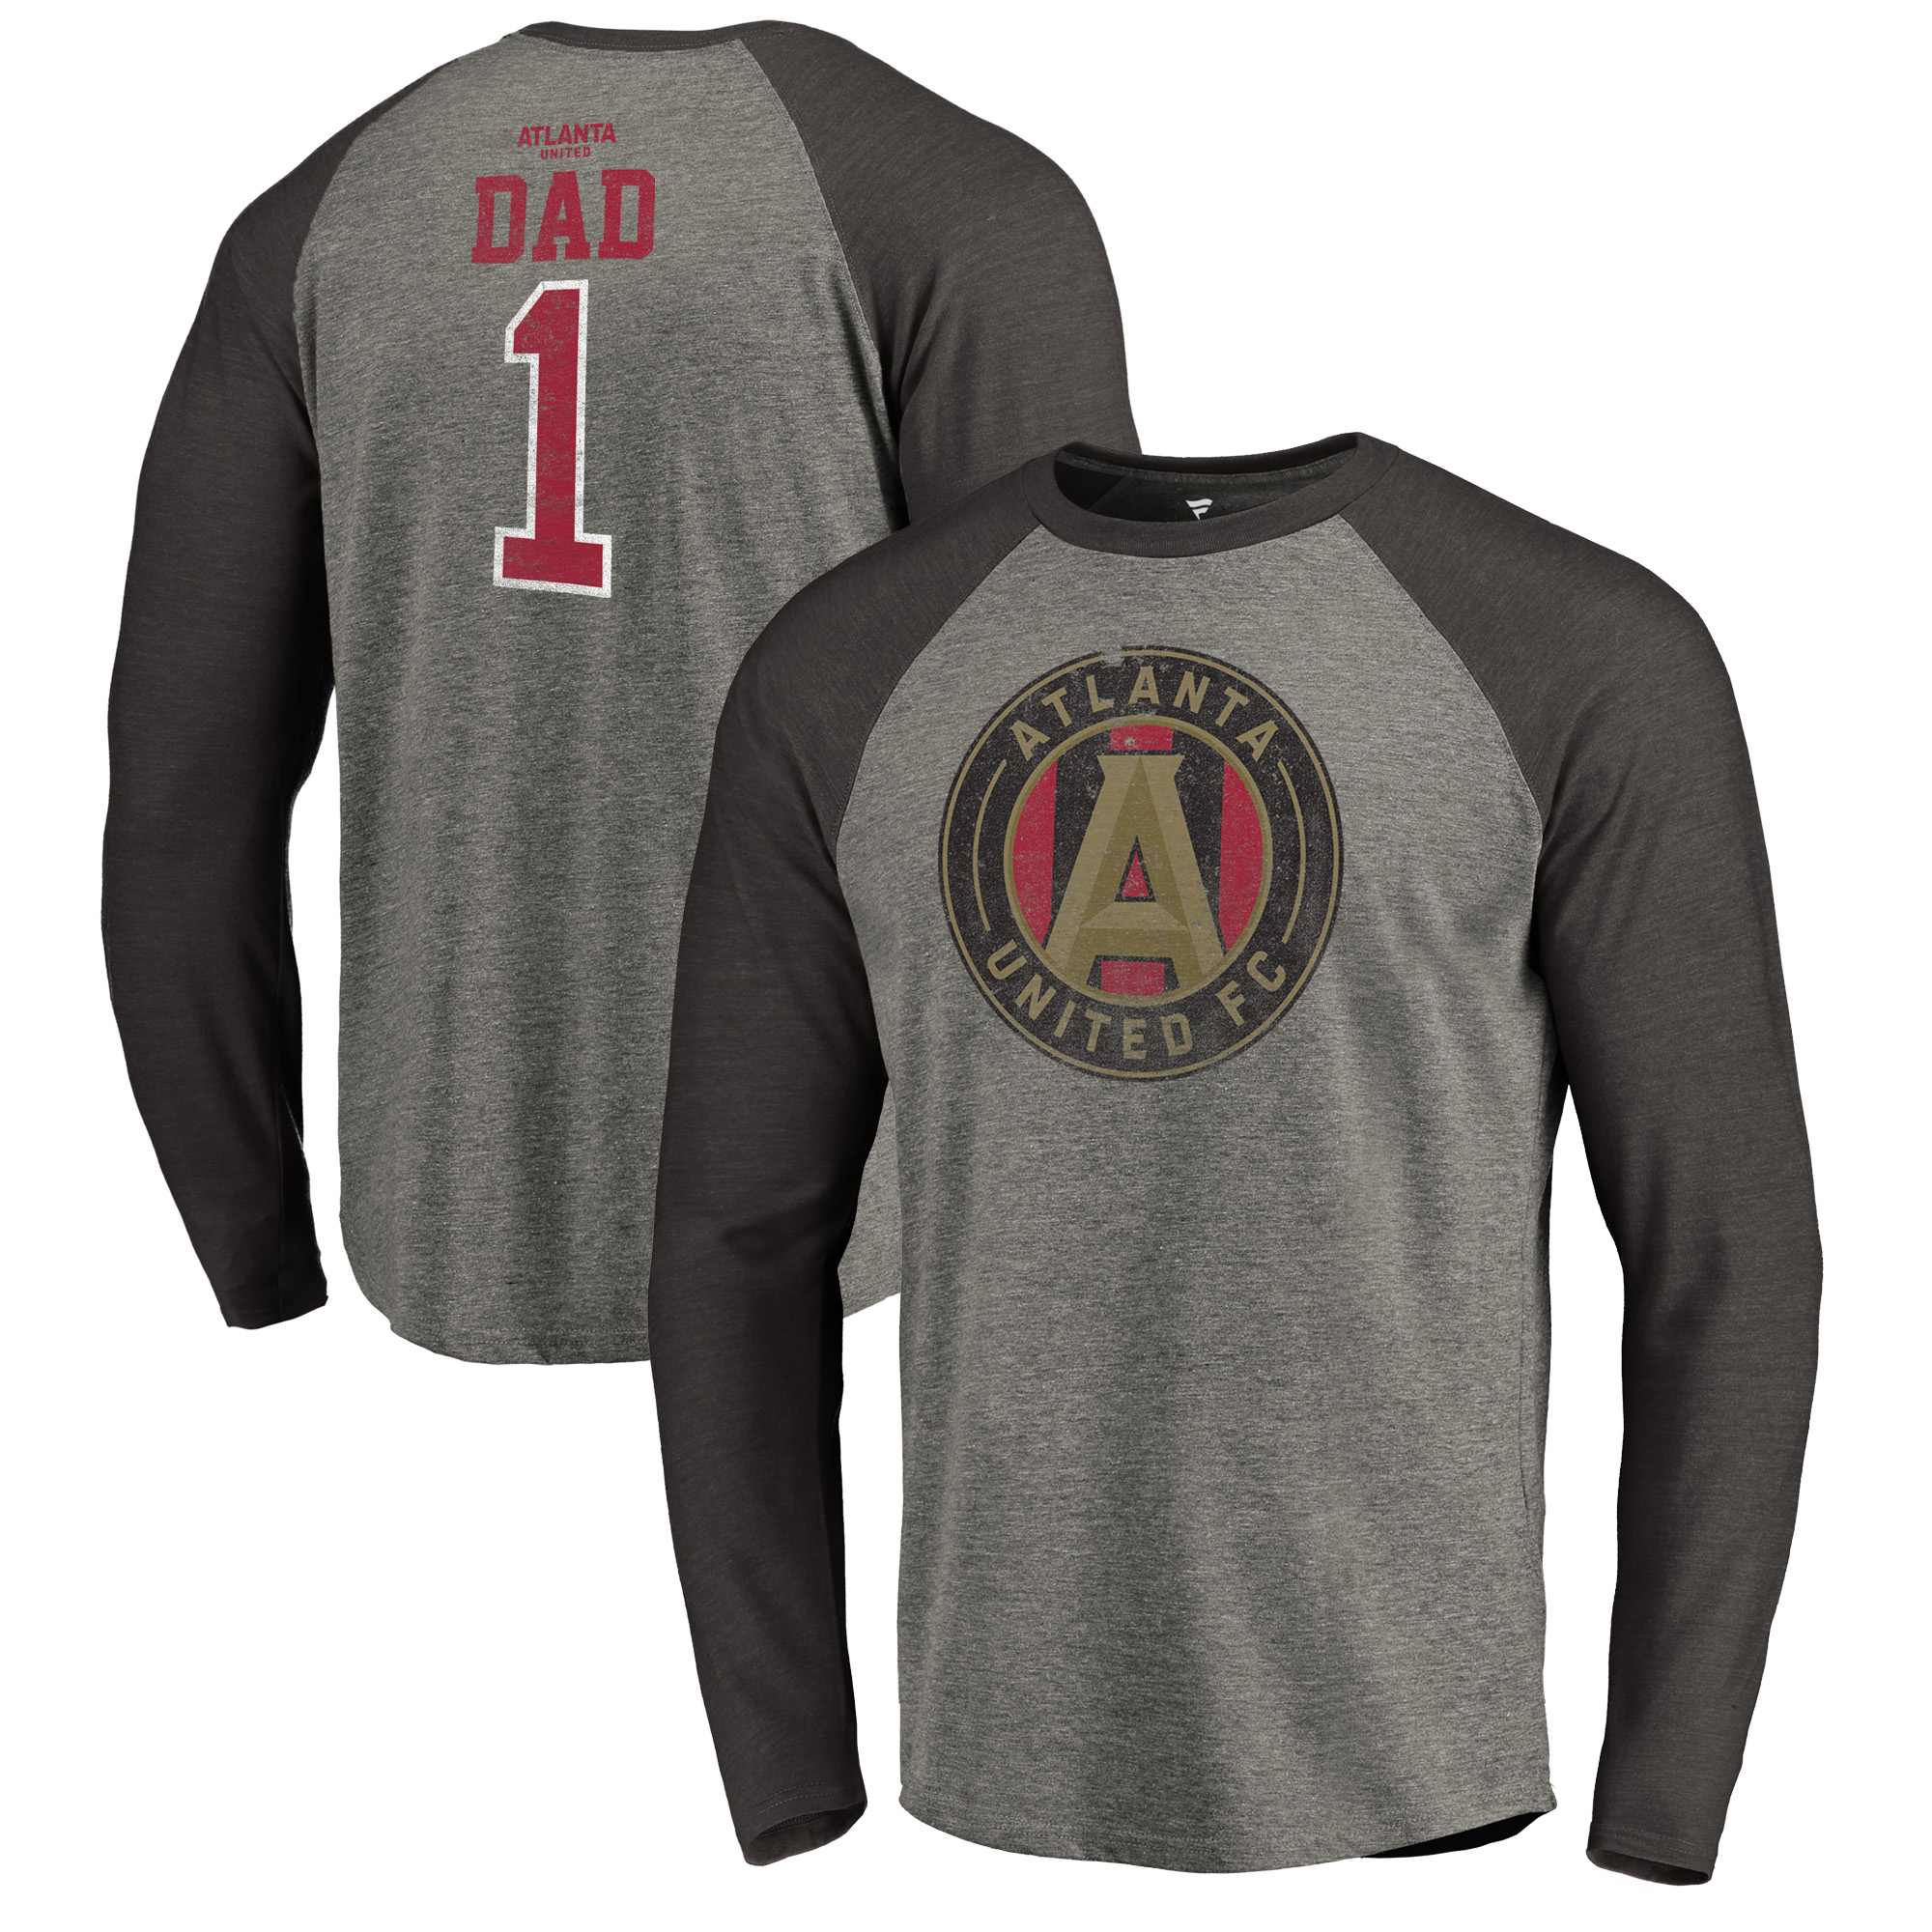 Atlanta United FC Fanatics Branded Greatest Dad Raglan T-Shirt - Heathered Gray